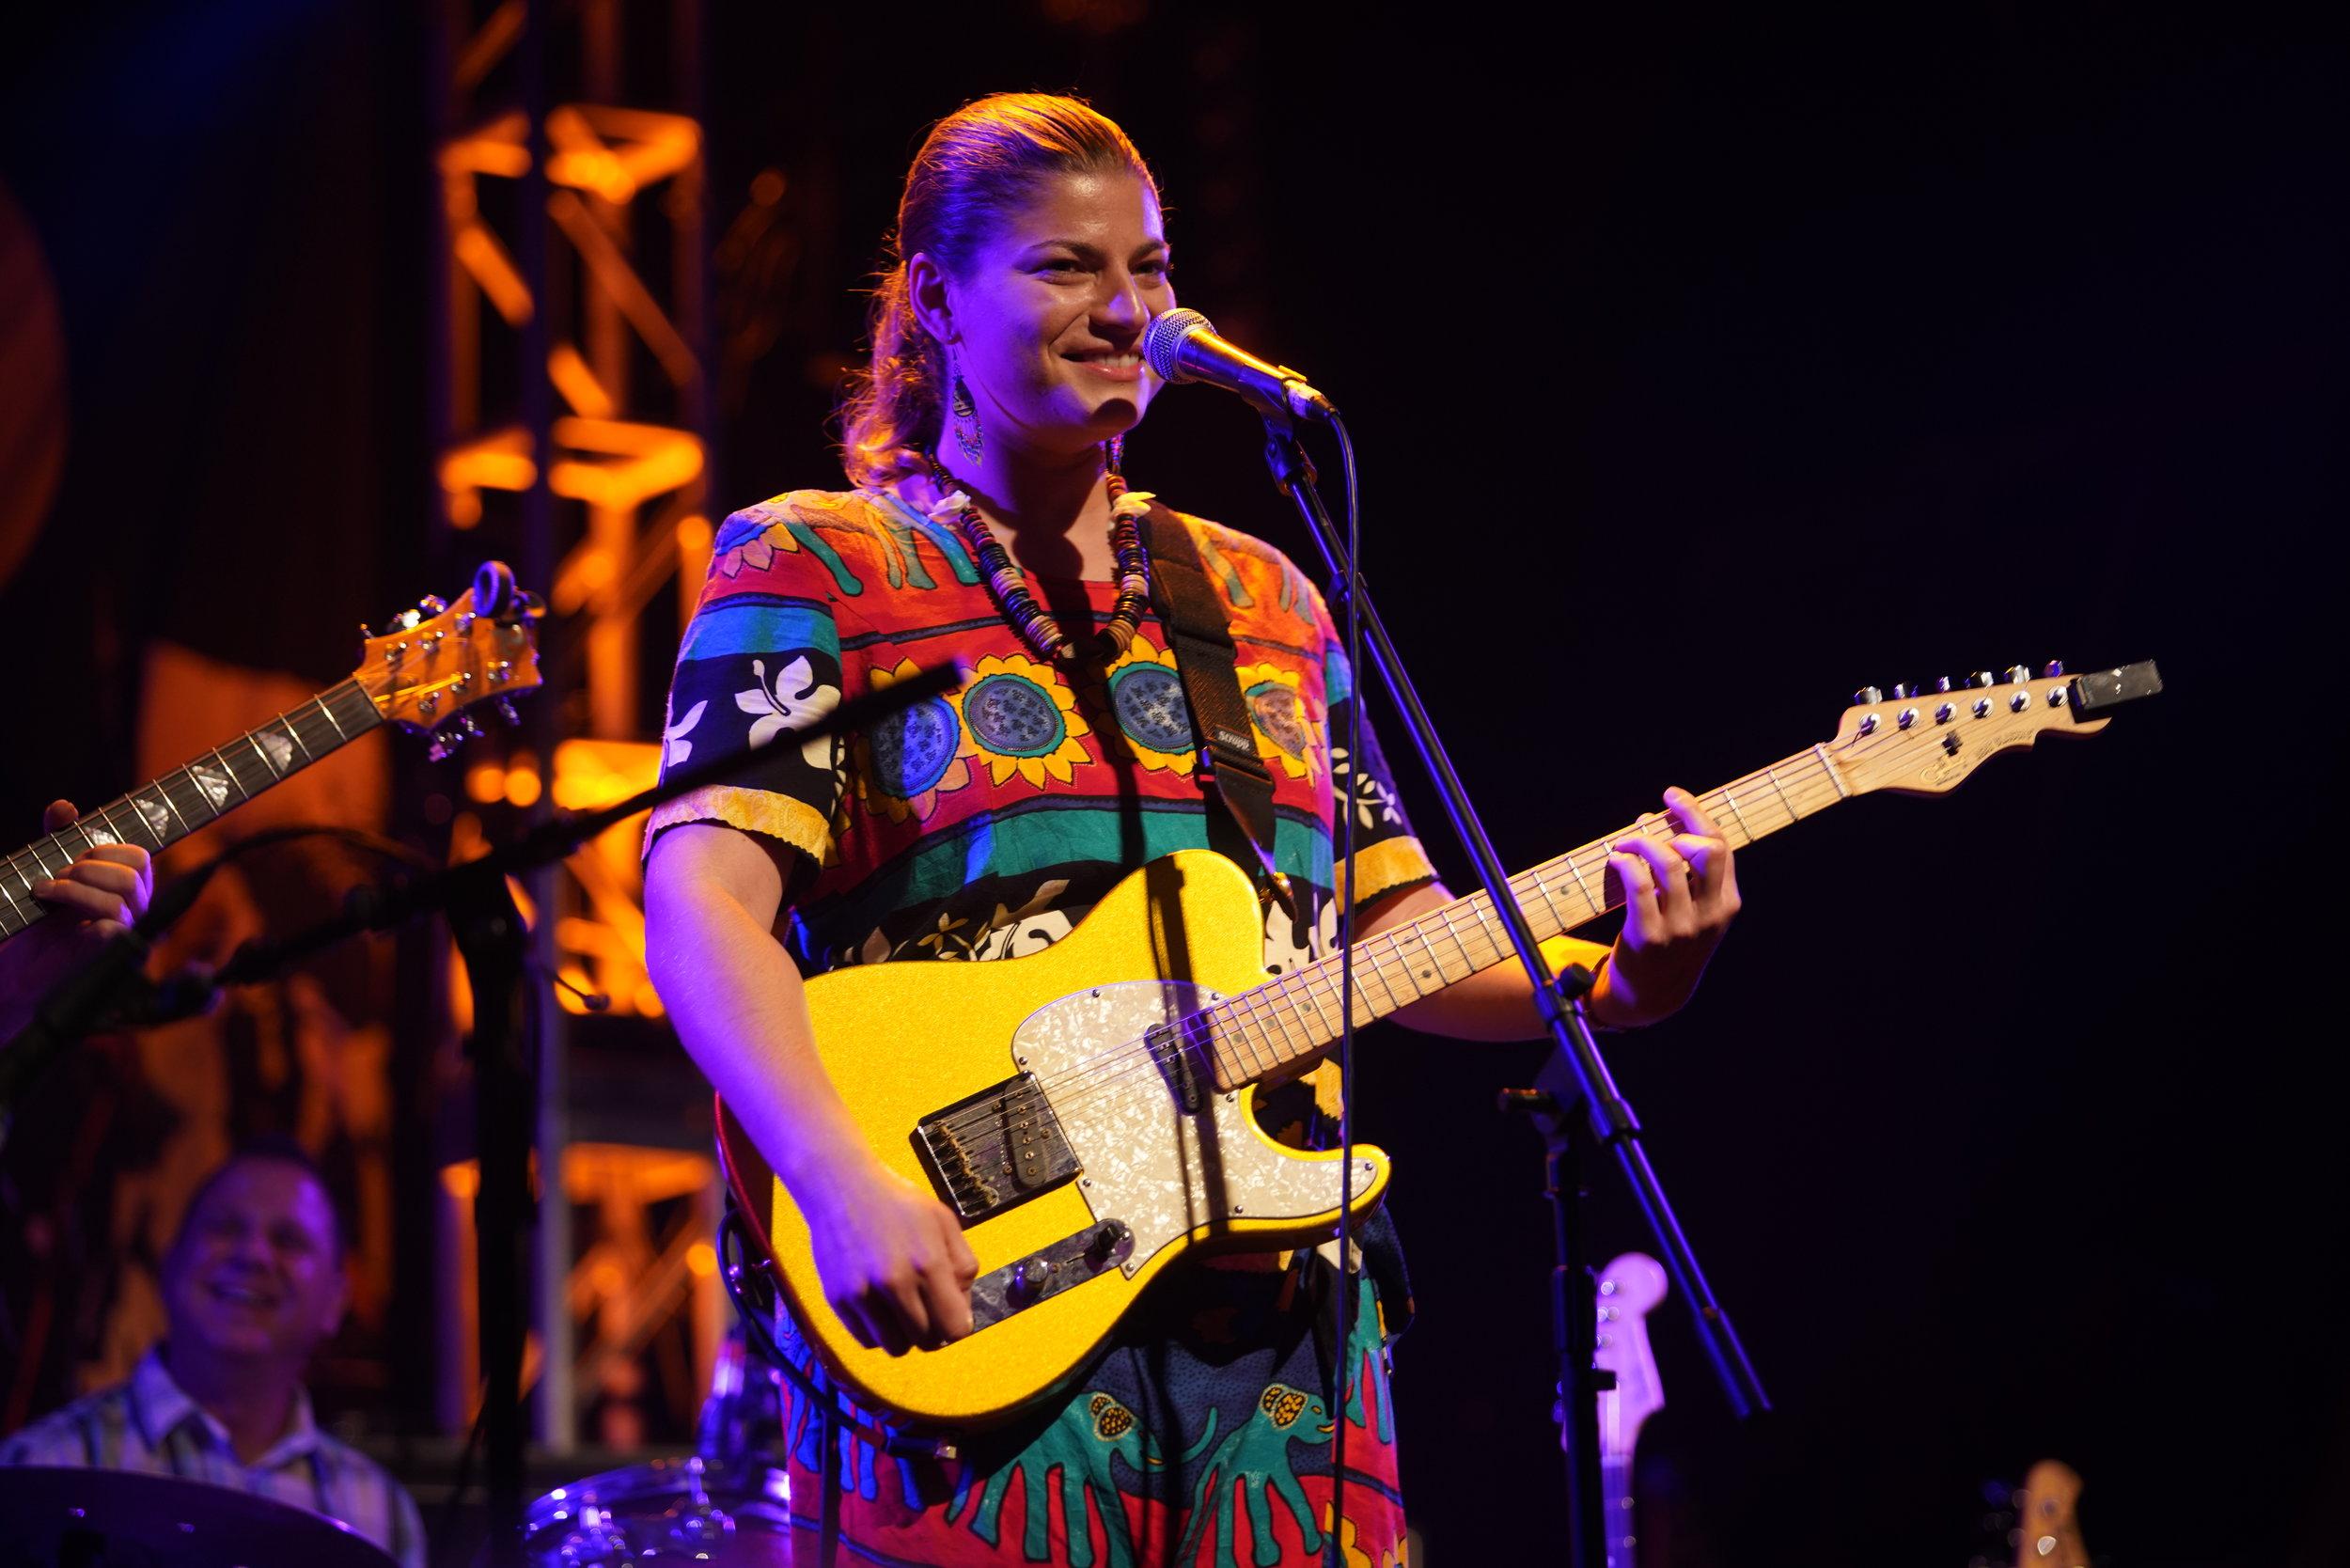 Lucy Morningstar - Lead singer / multi-instrumentalist